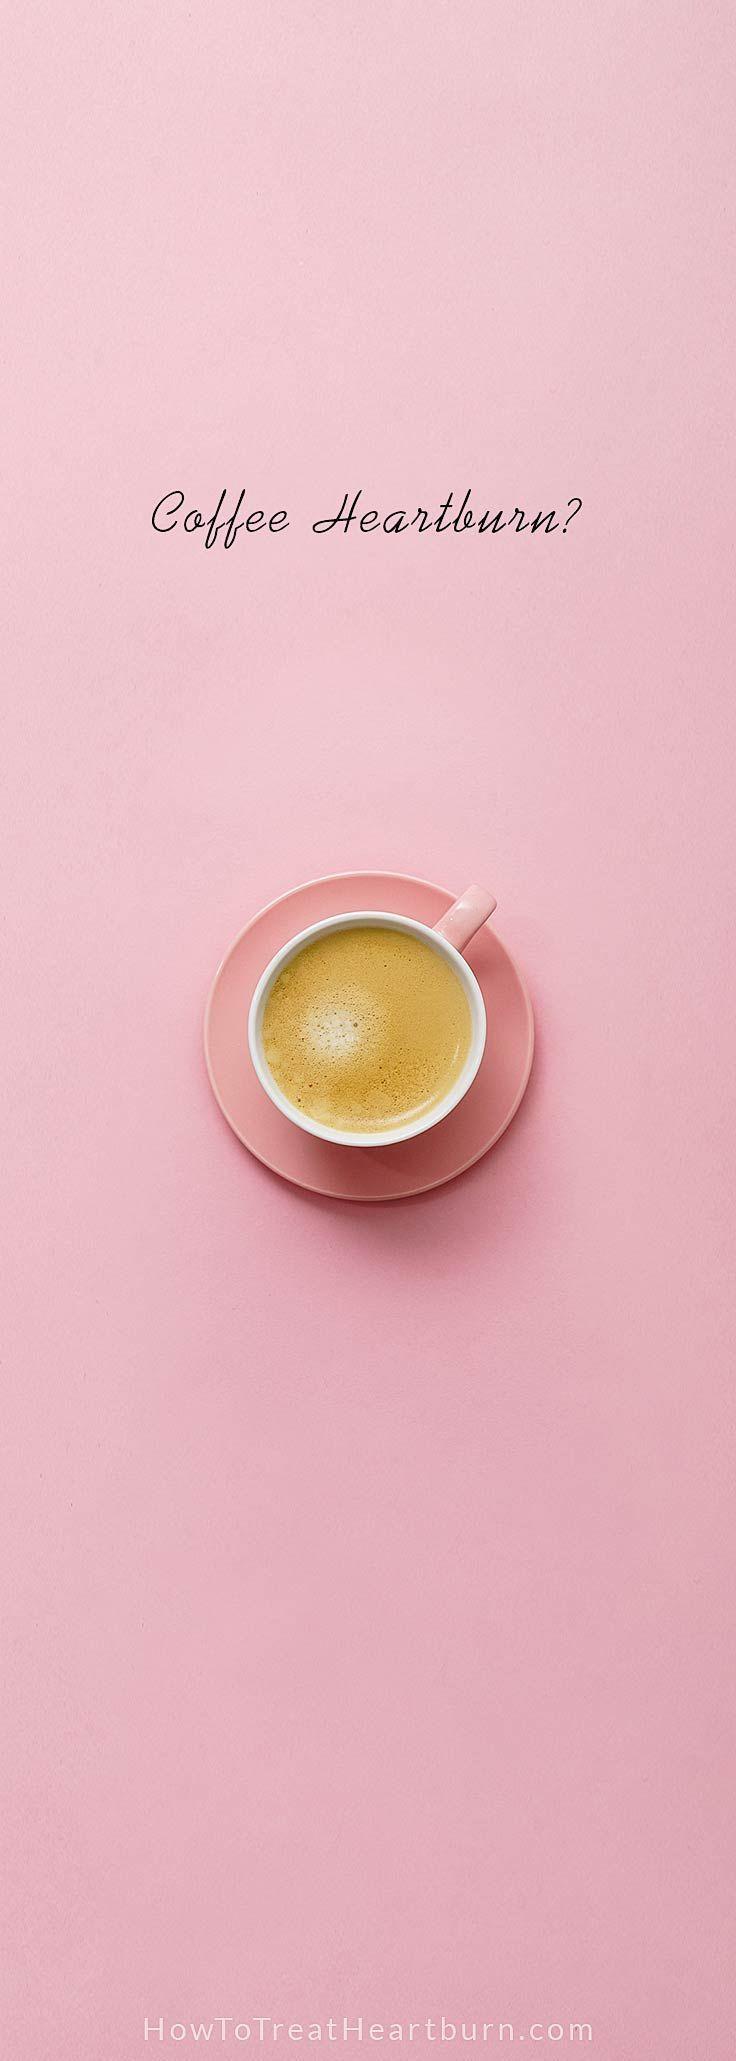 44+ Will coffee cause heartburn inspirations